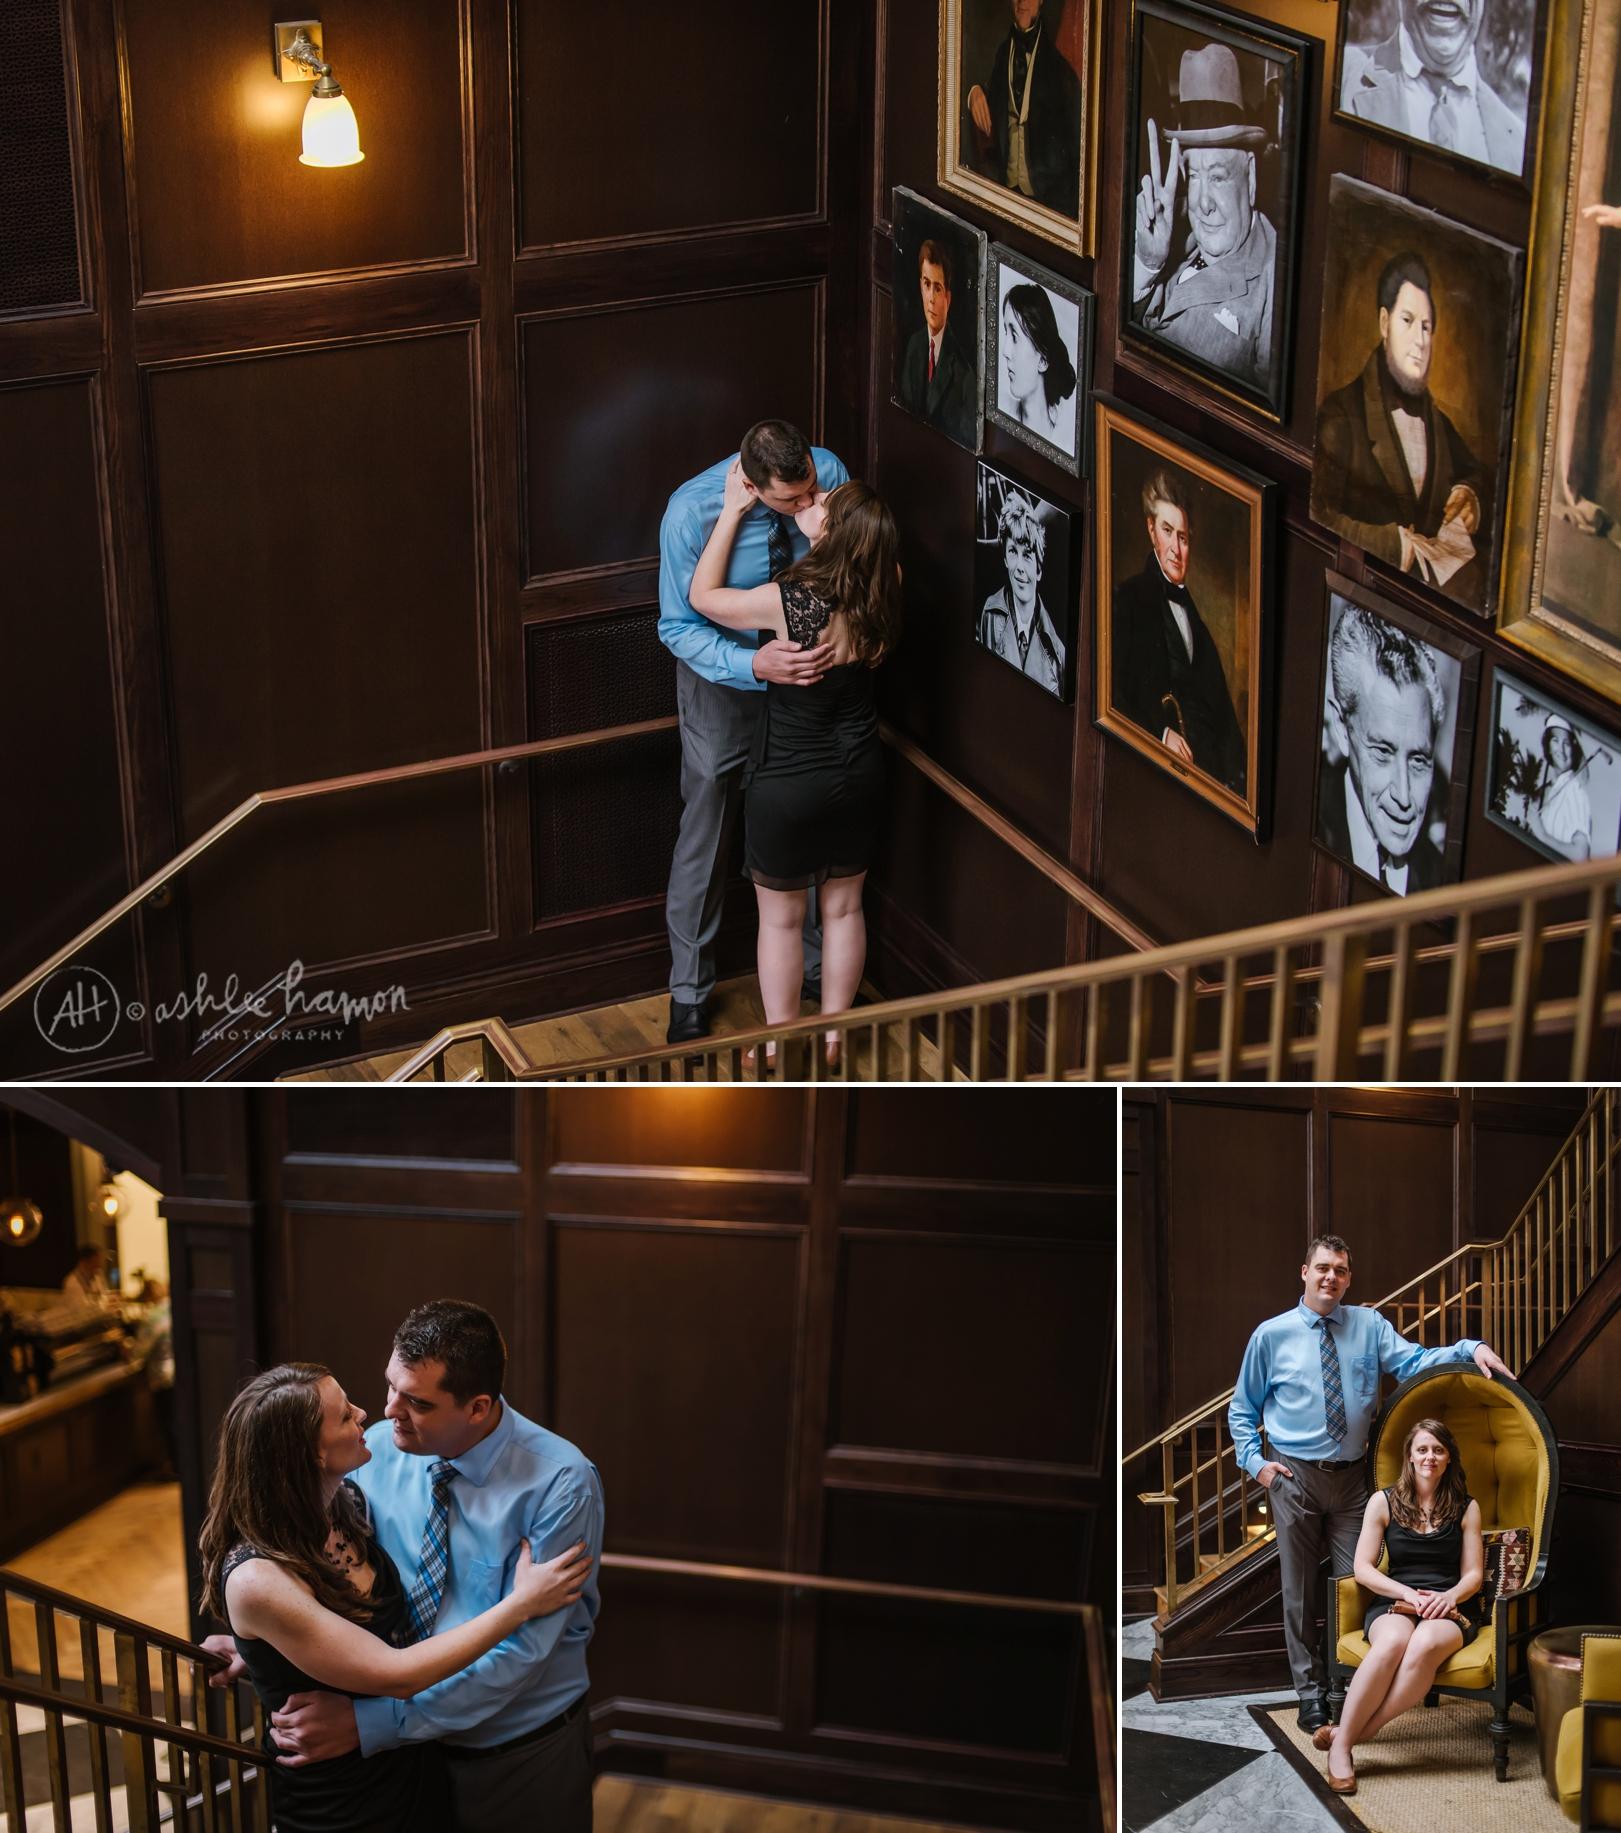 tampa-engagement-photographer-oxford-exchange_0005.jpg